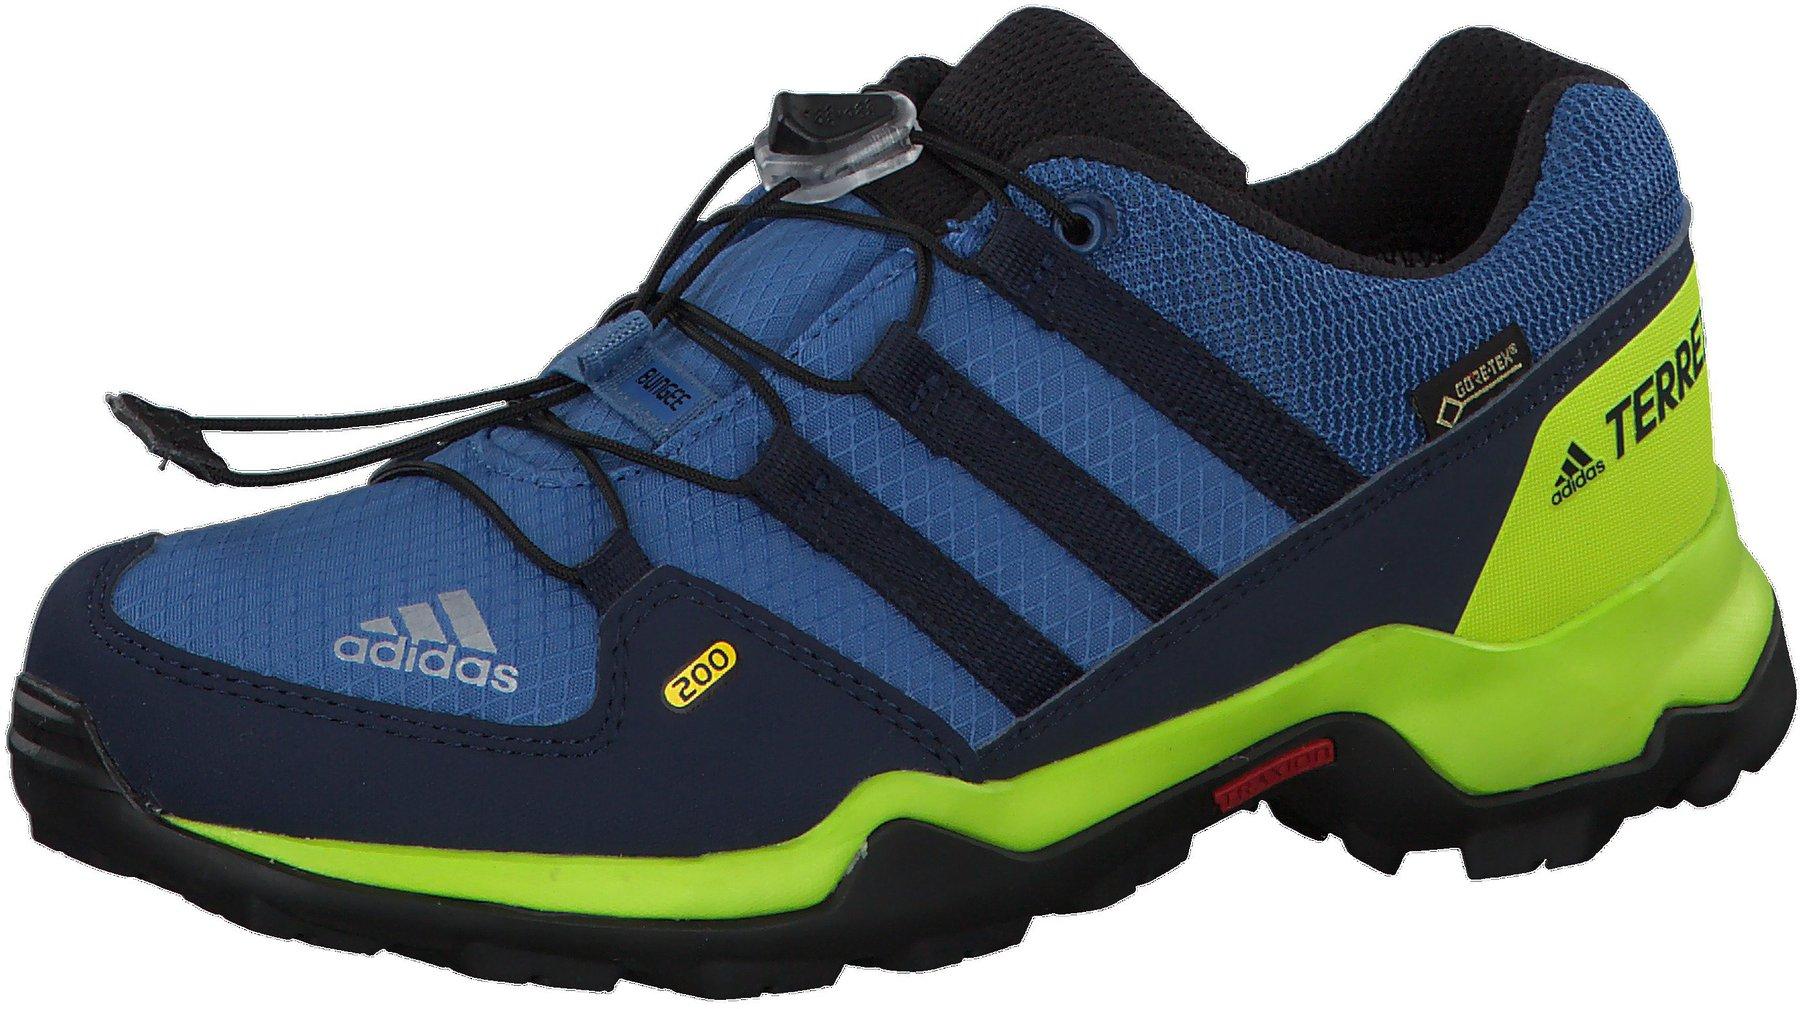 new product f5e22 9034d Adidas Terrex Low K ab 49,99 € günstig im Preisvergleich kaufen